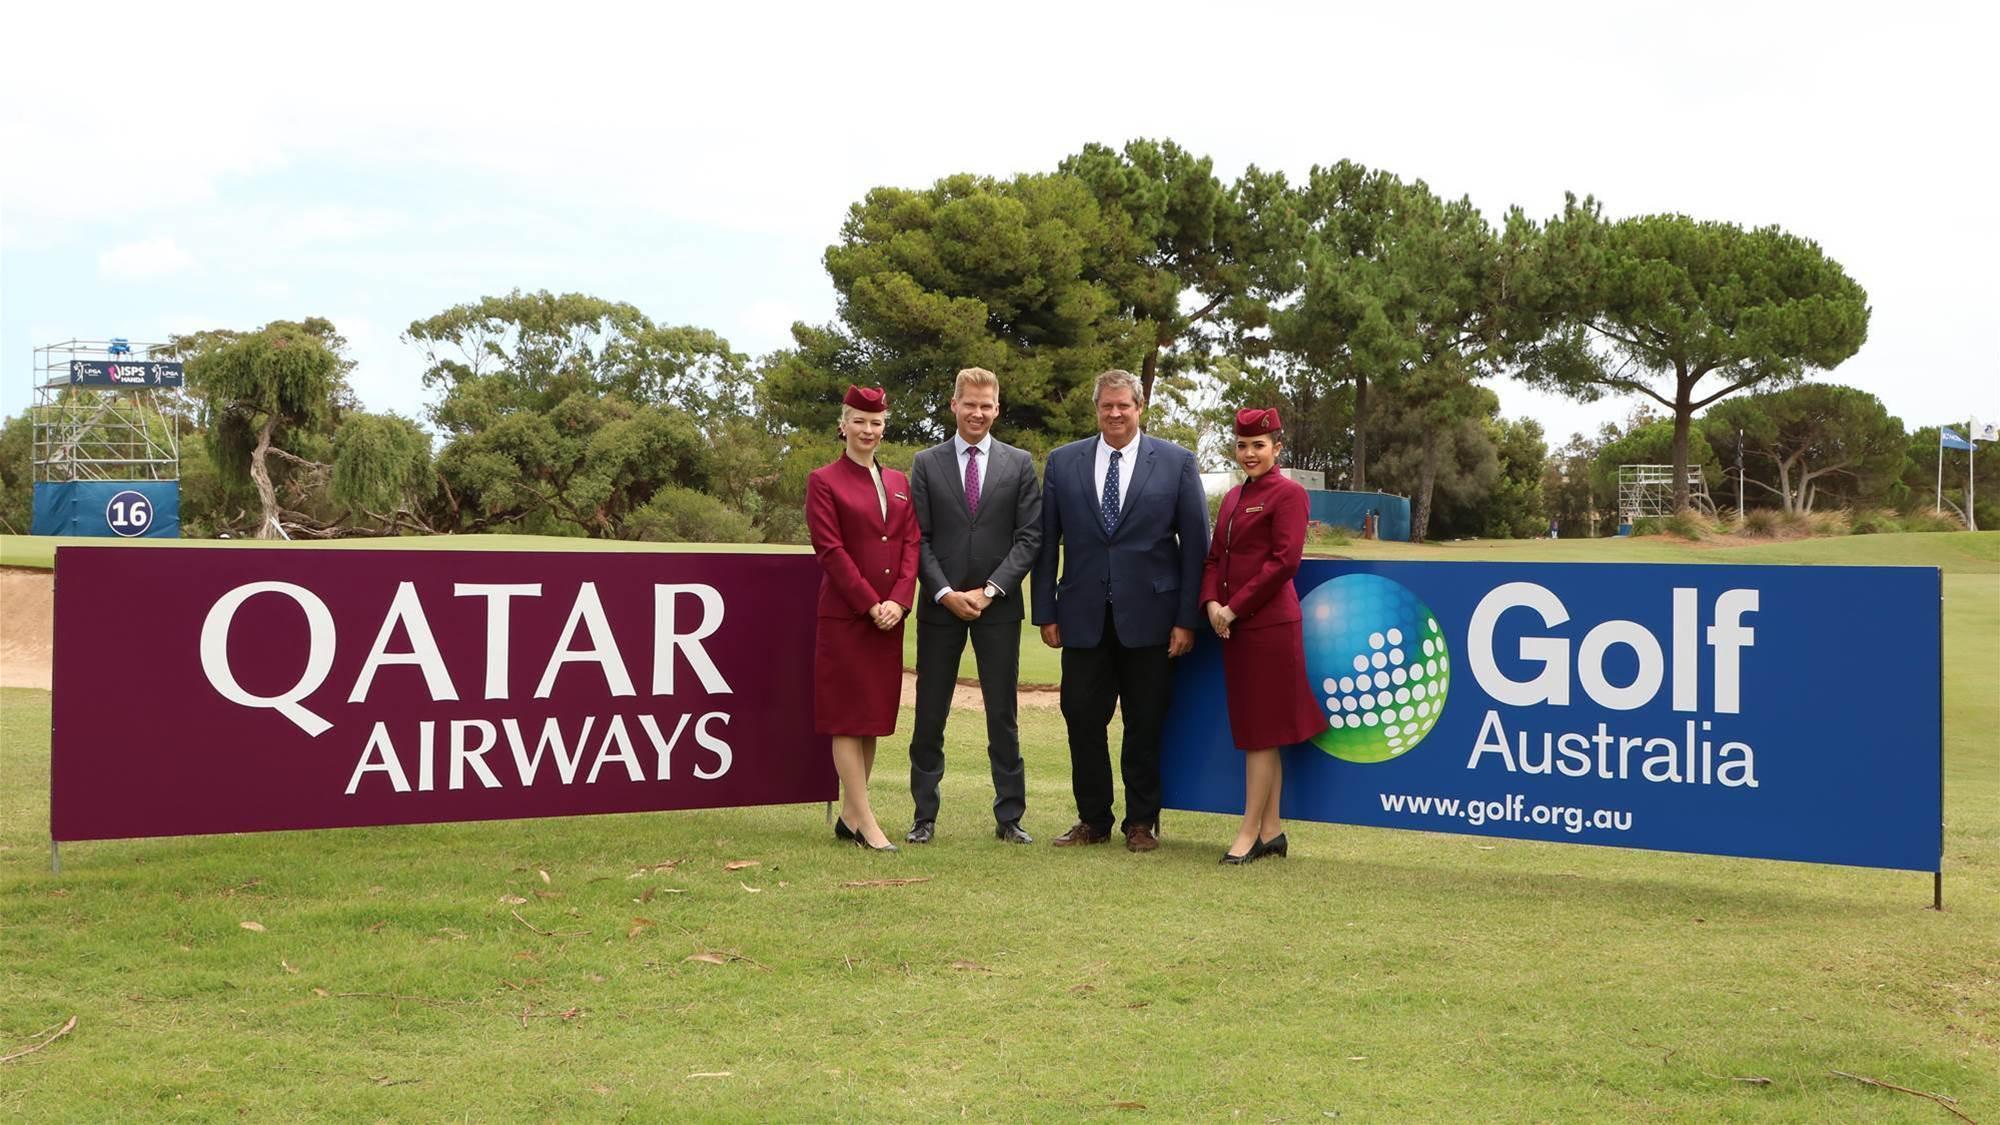 Qatar Airways becomes official partner of Golf Australia